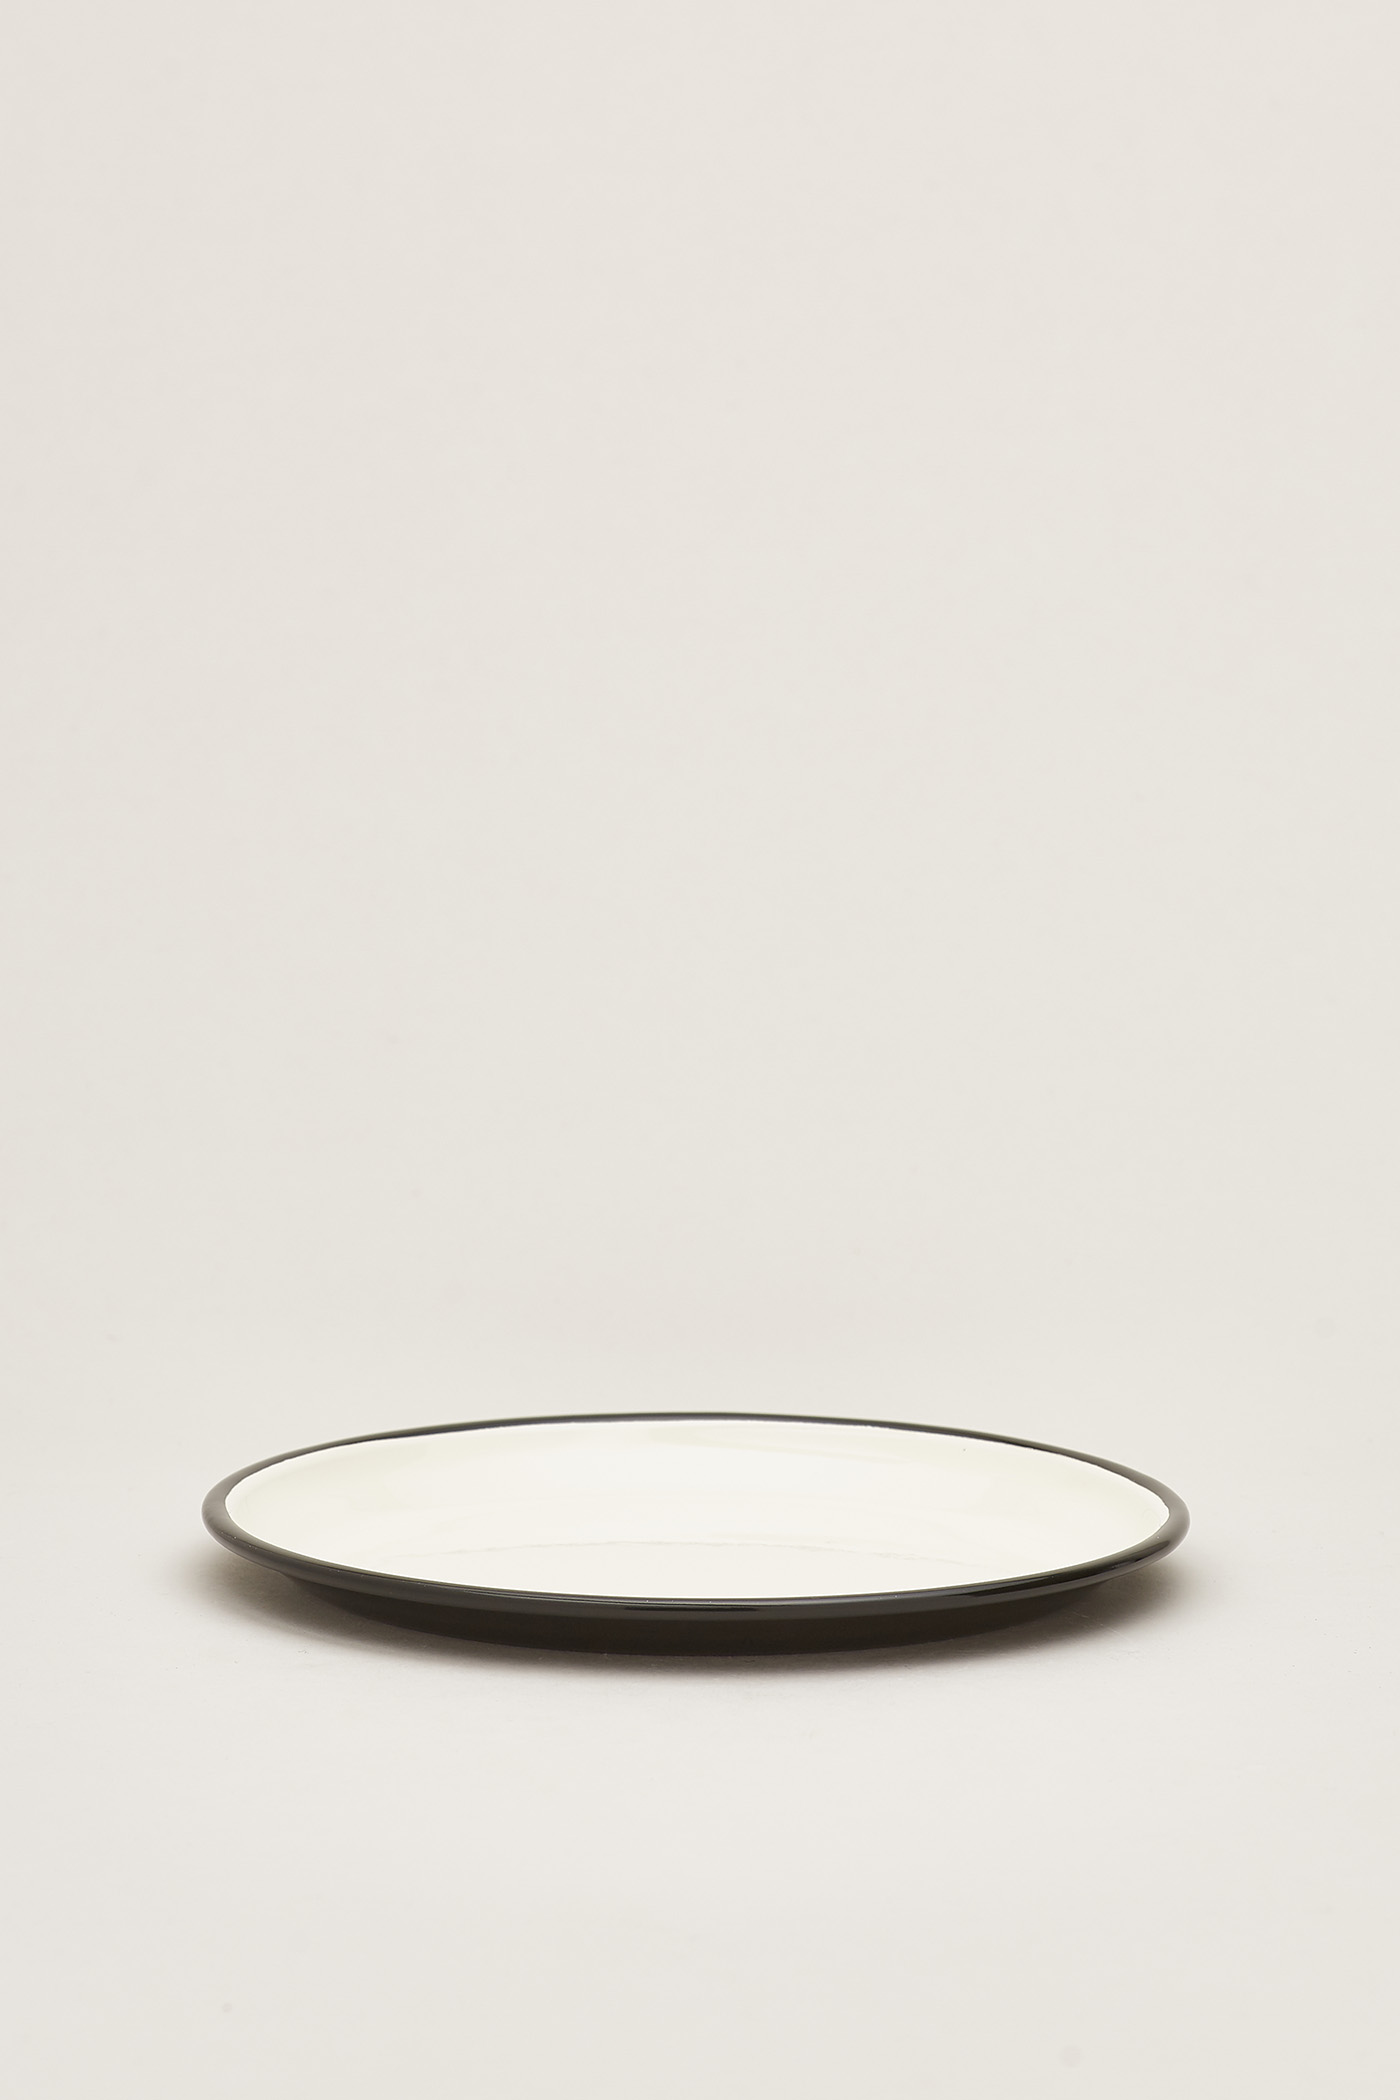 Rolf Enamel Medium Plate